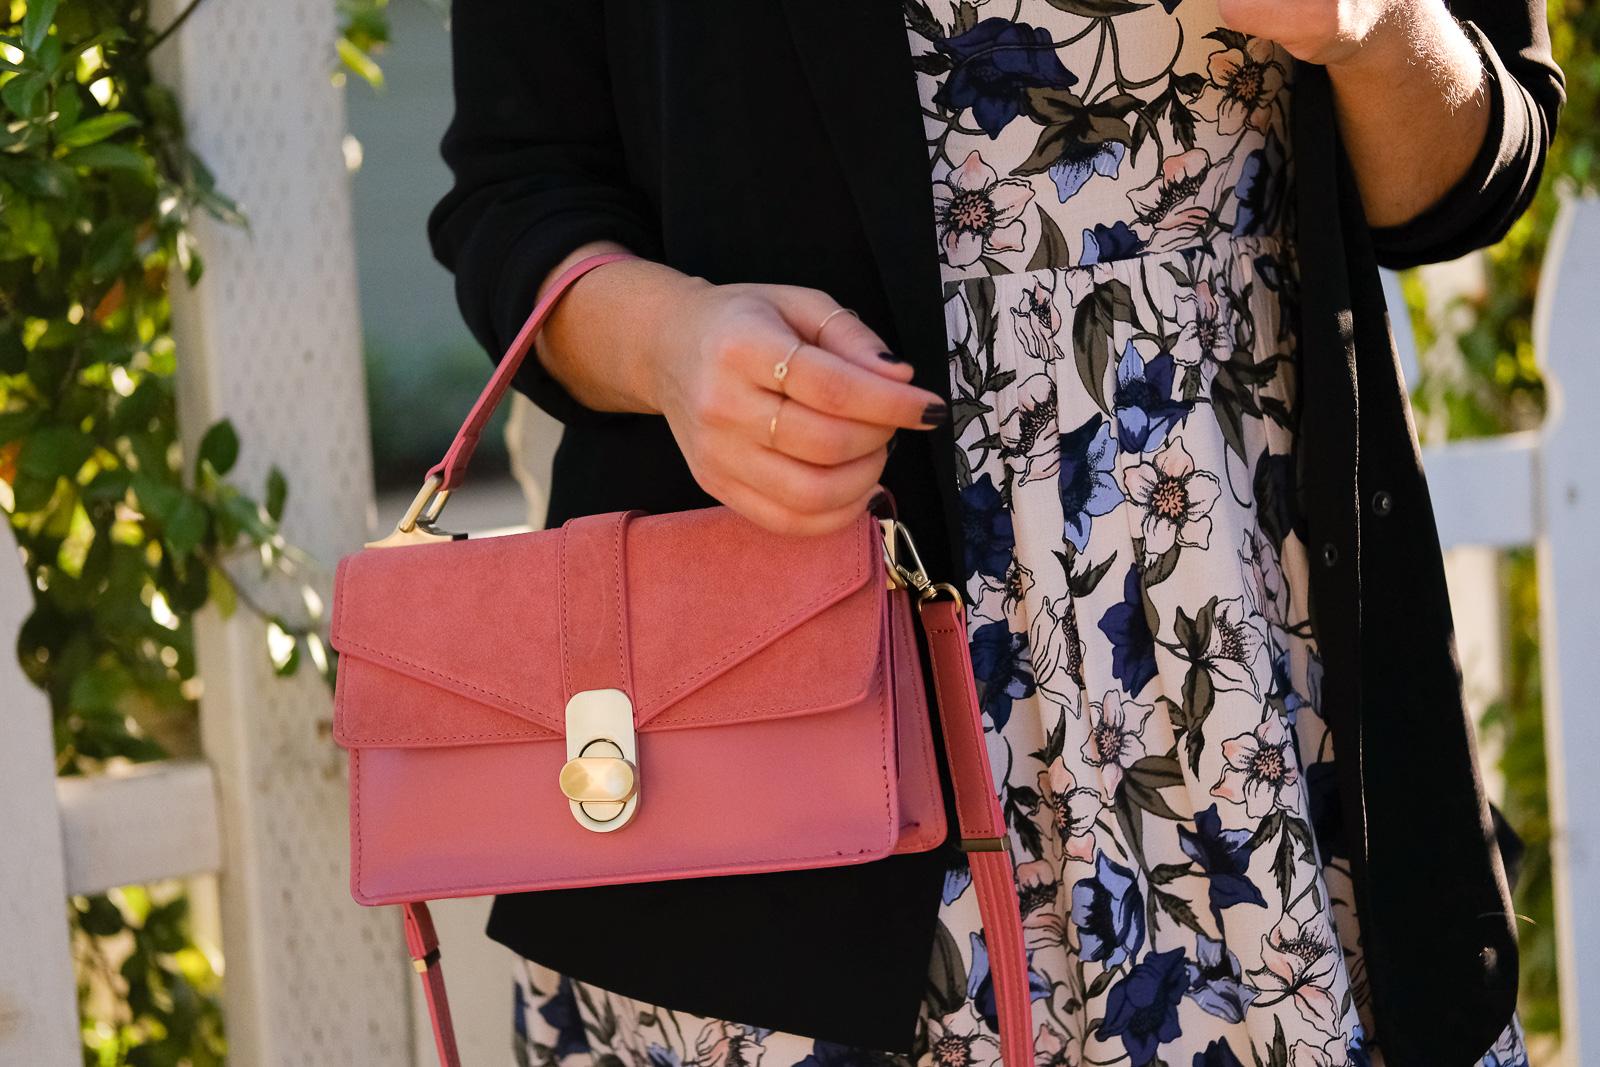 Pink handbag and floral dress creative job interview look